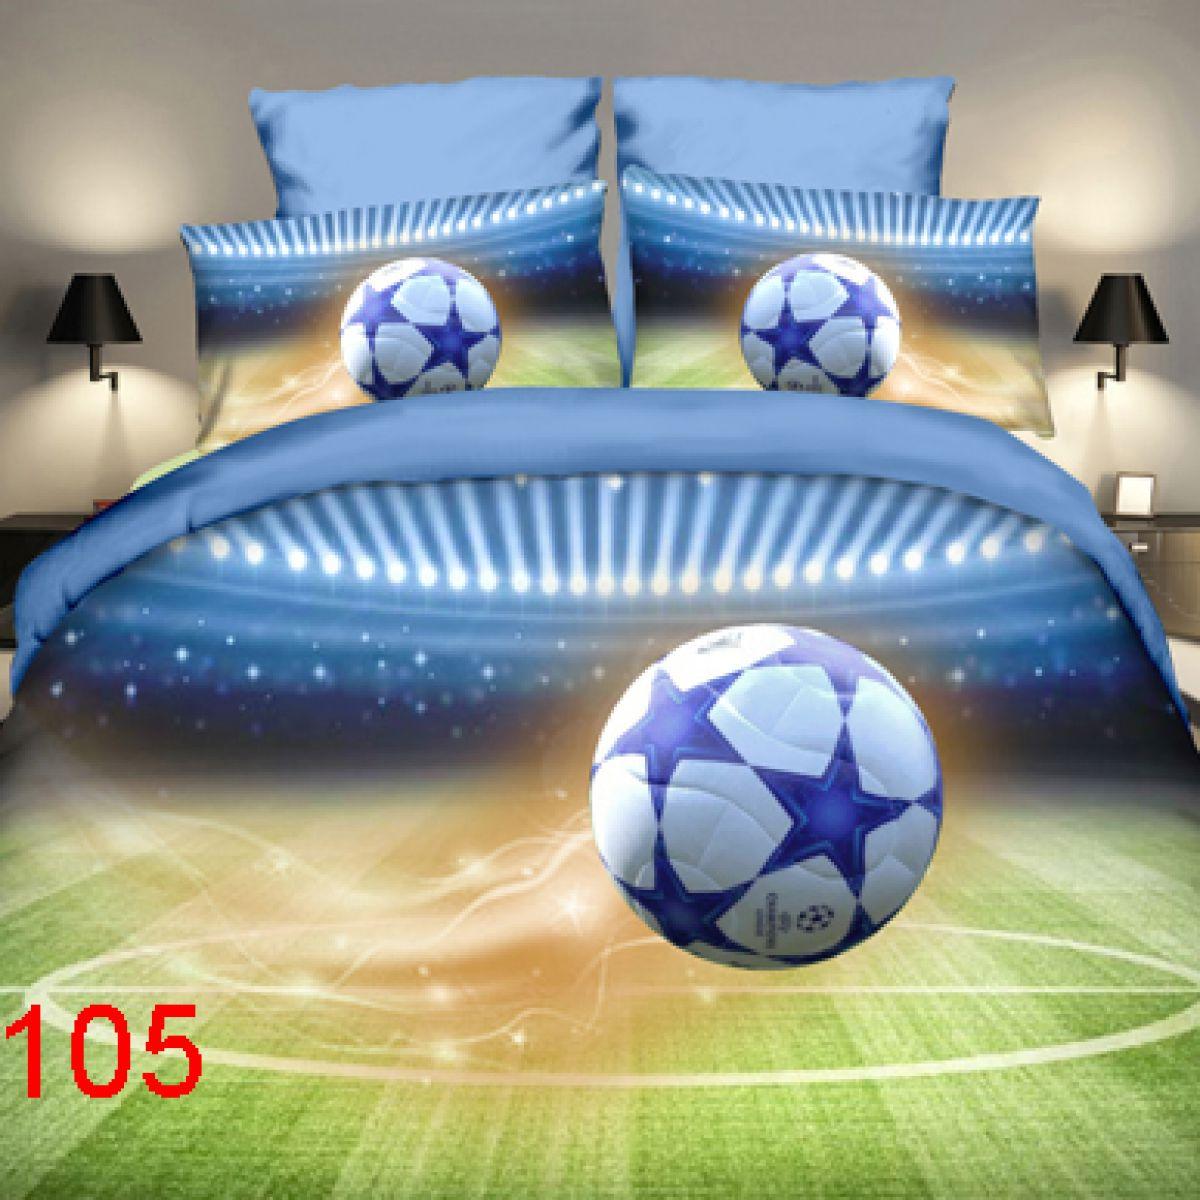 3D Beddings - Antonio - AML-105- 160x200 cm - 4 pcs